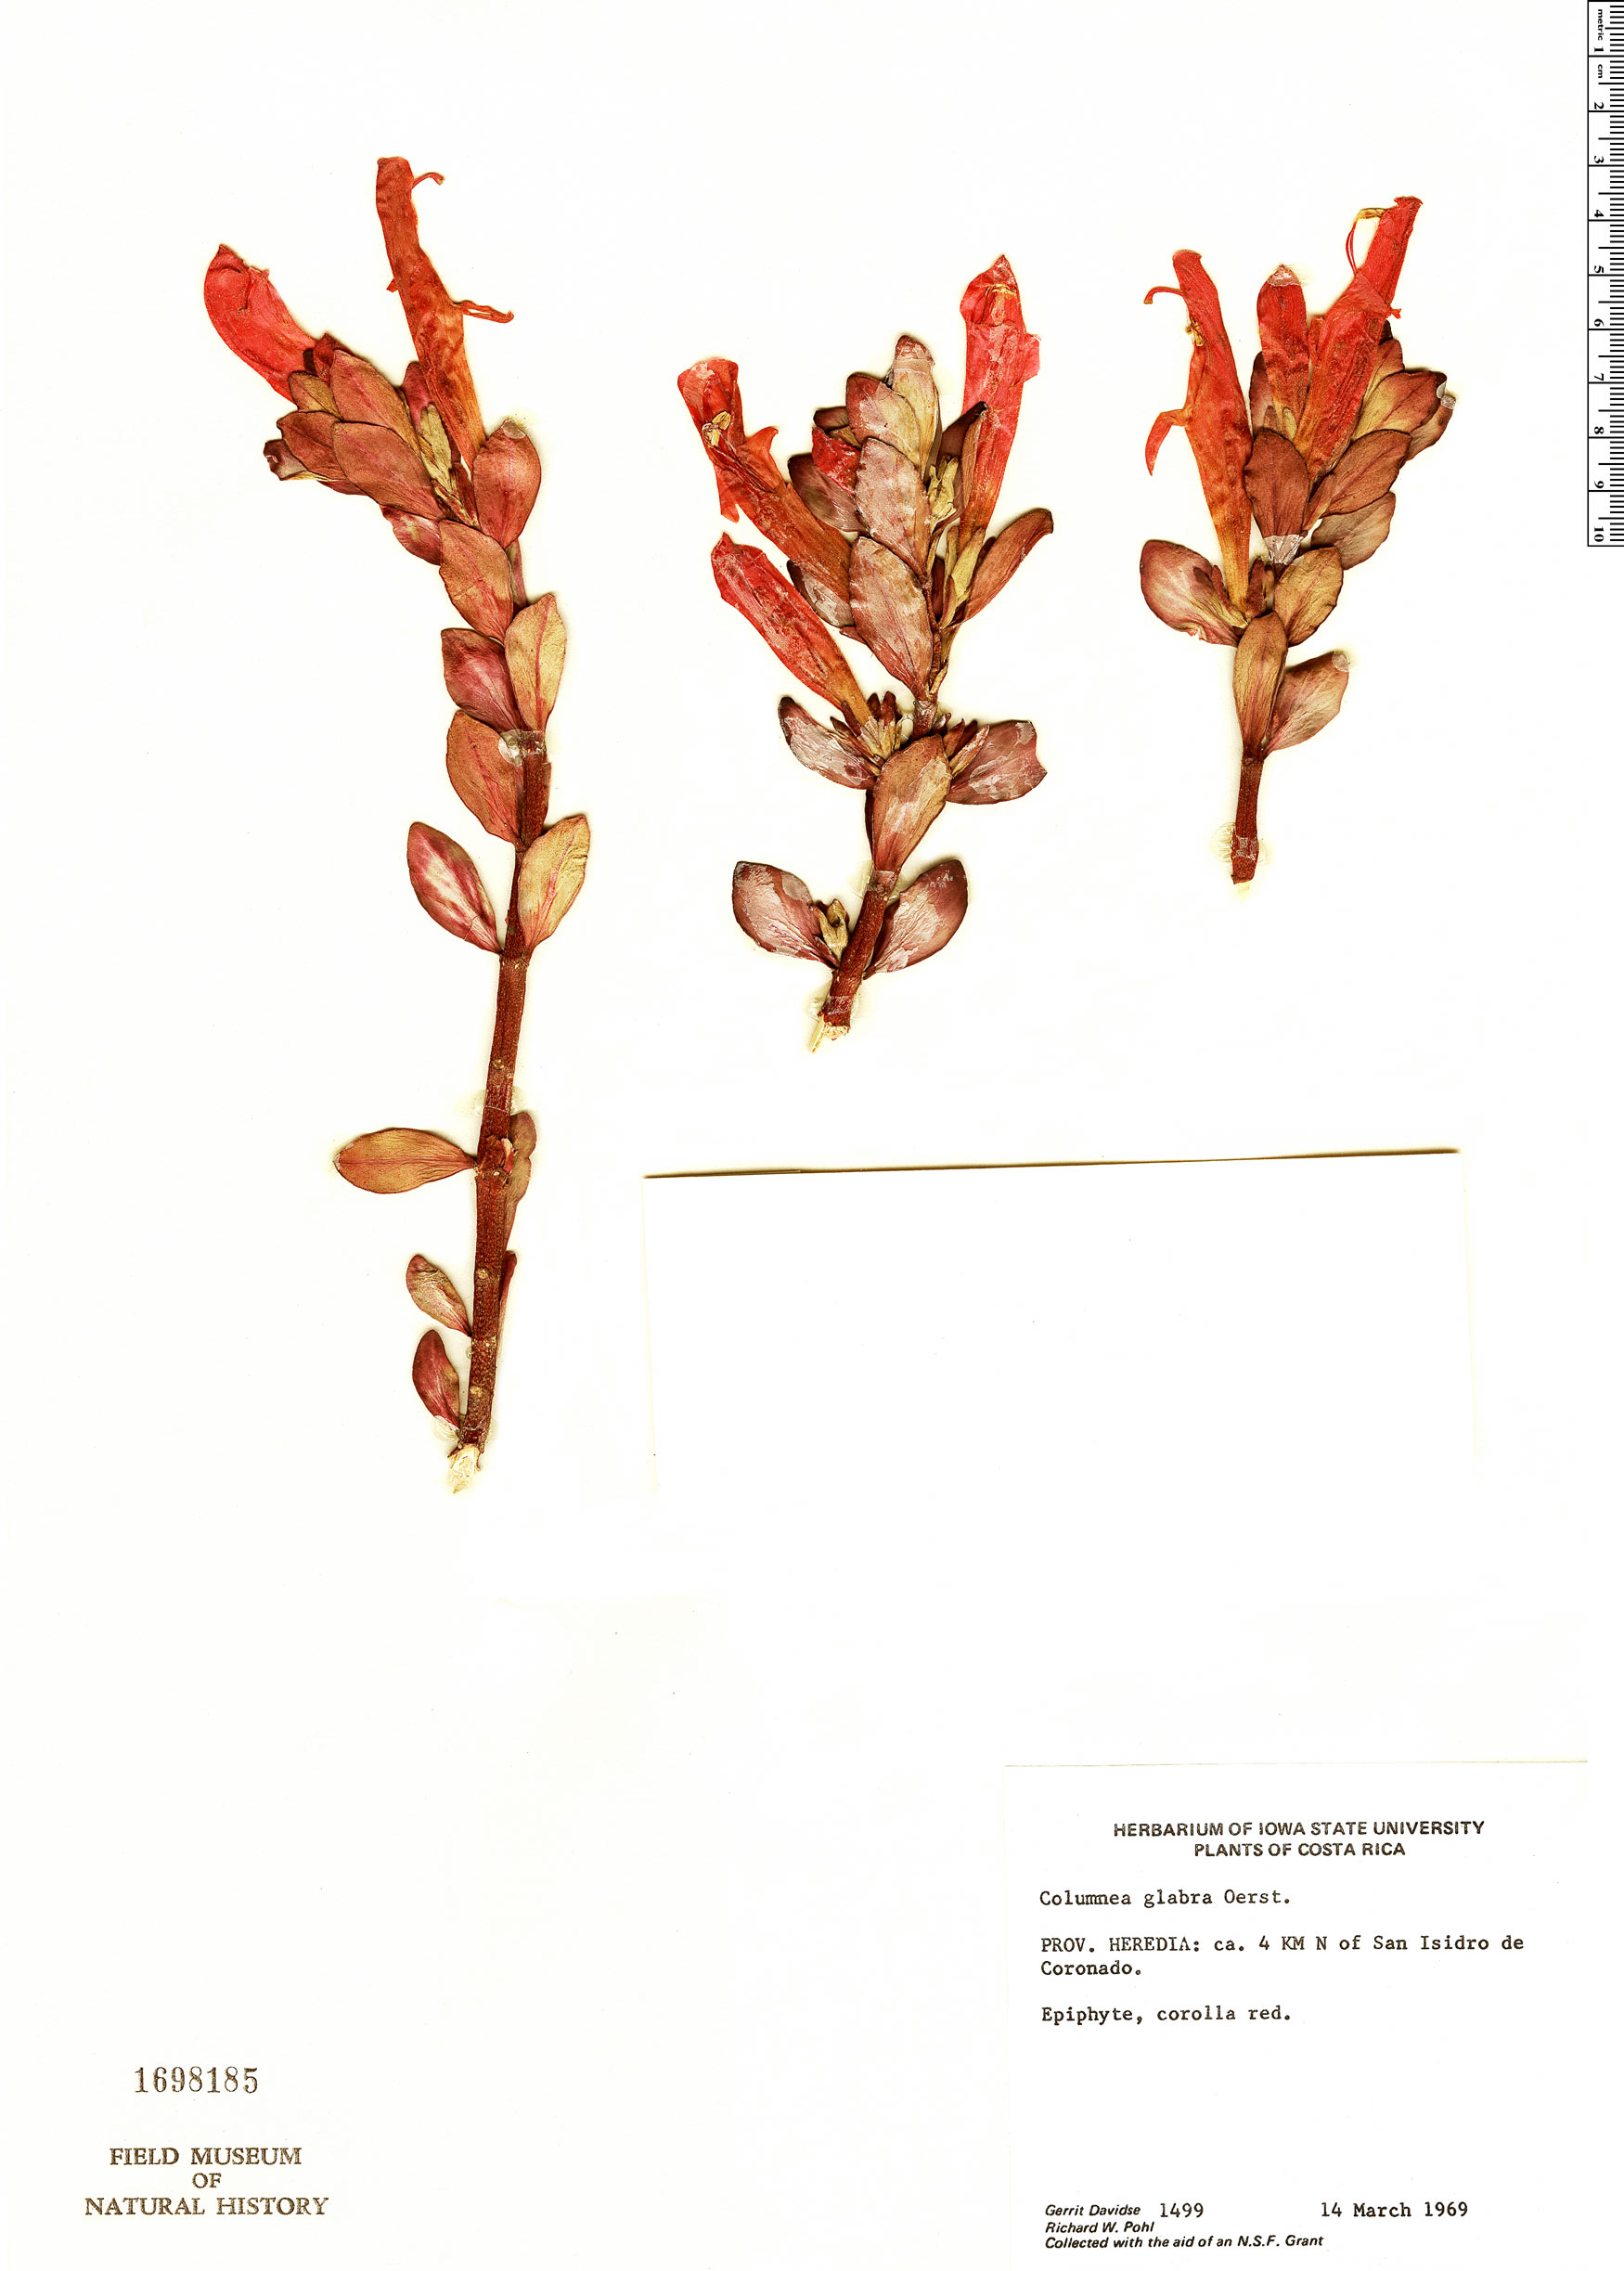 Specimen: Columnea glabra